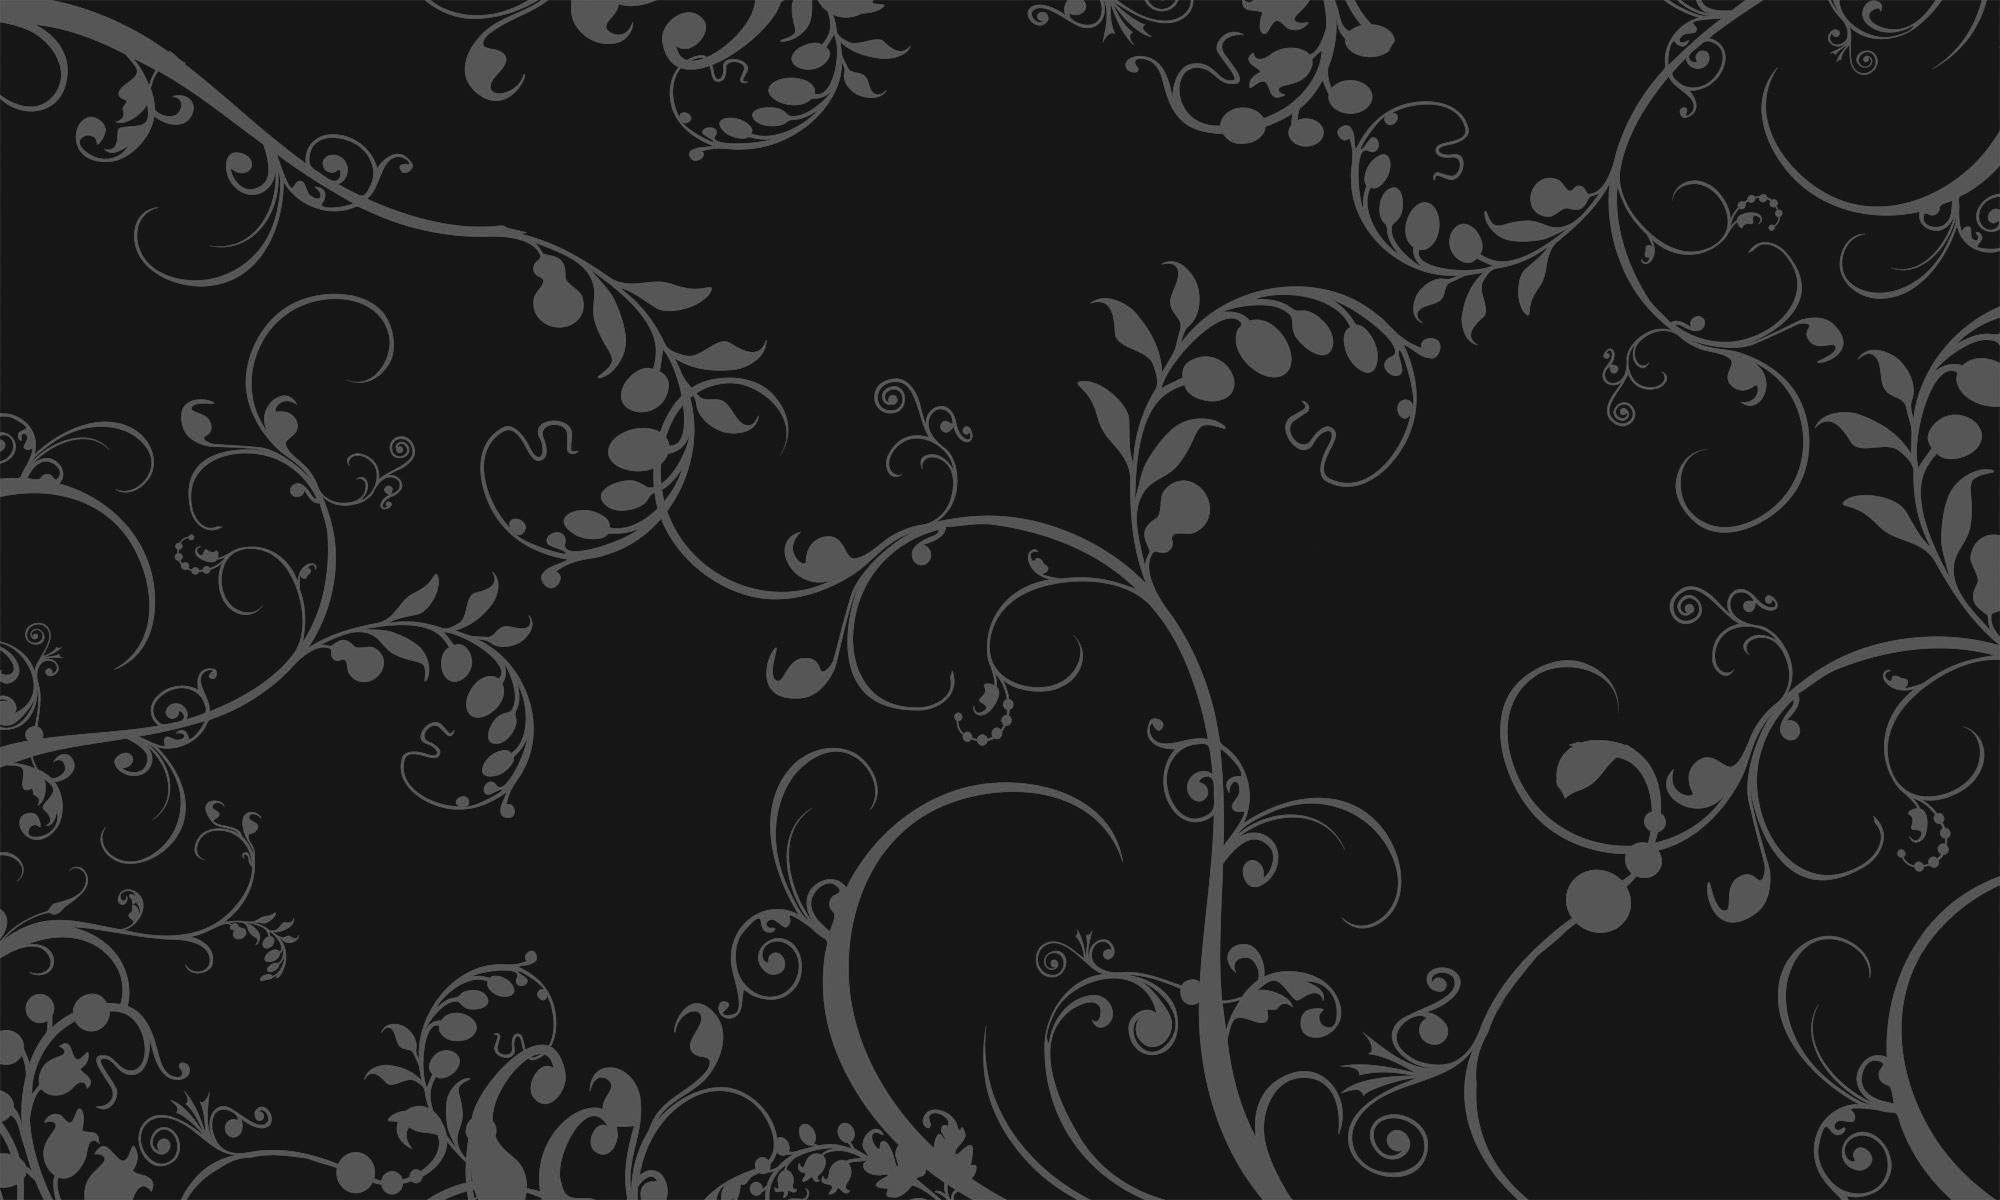 42+ Nail Salon Wallpaper on WallpaperSafari